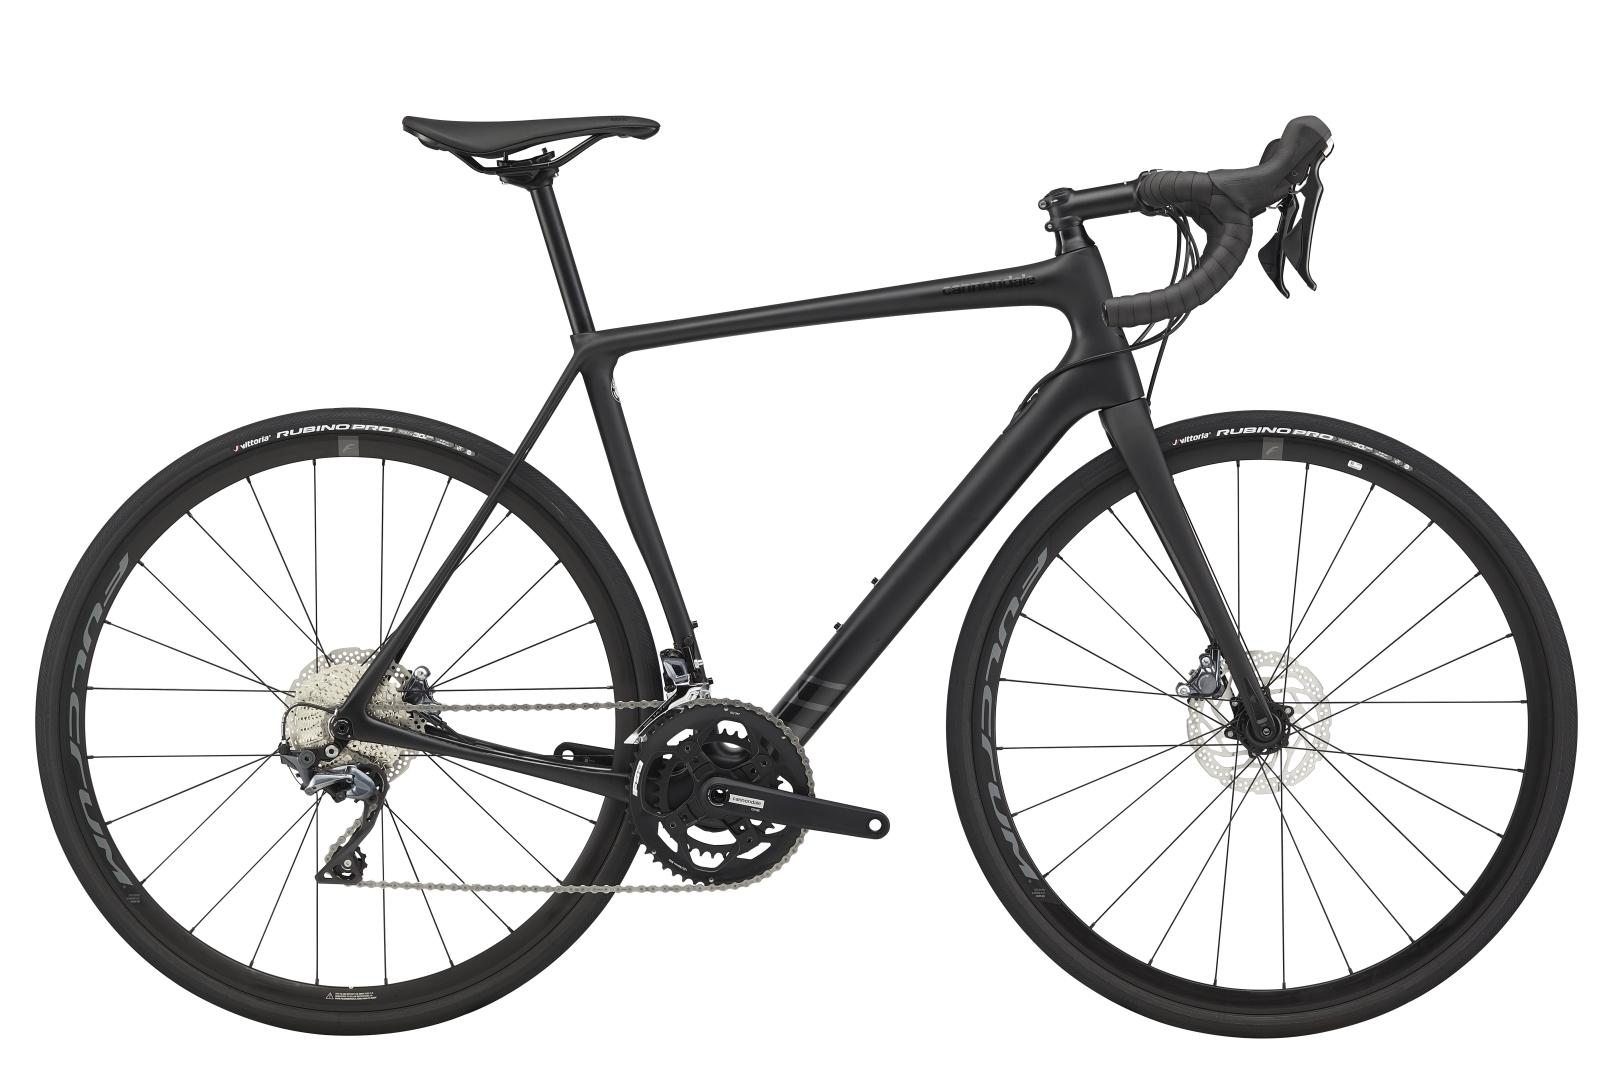 Cannondale Synapse Carbon Ultegra országúti kerékpár - szürke - 58 cm (2020)